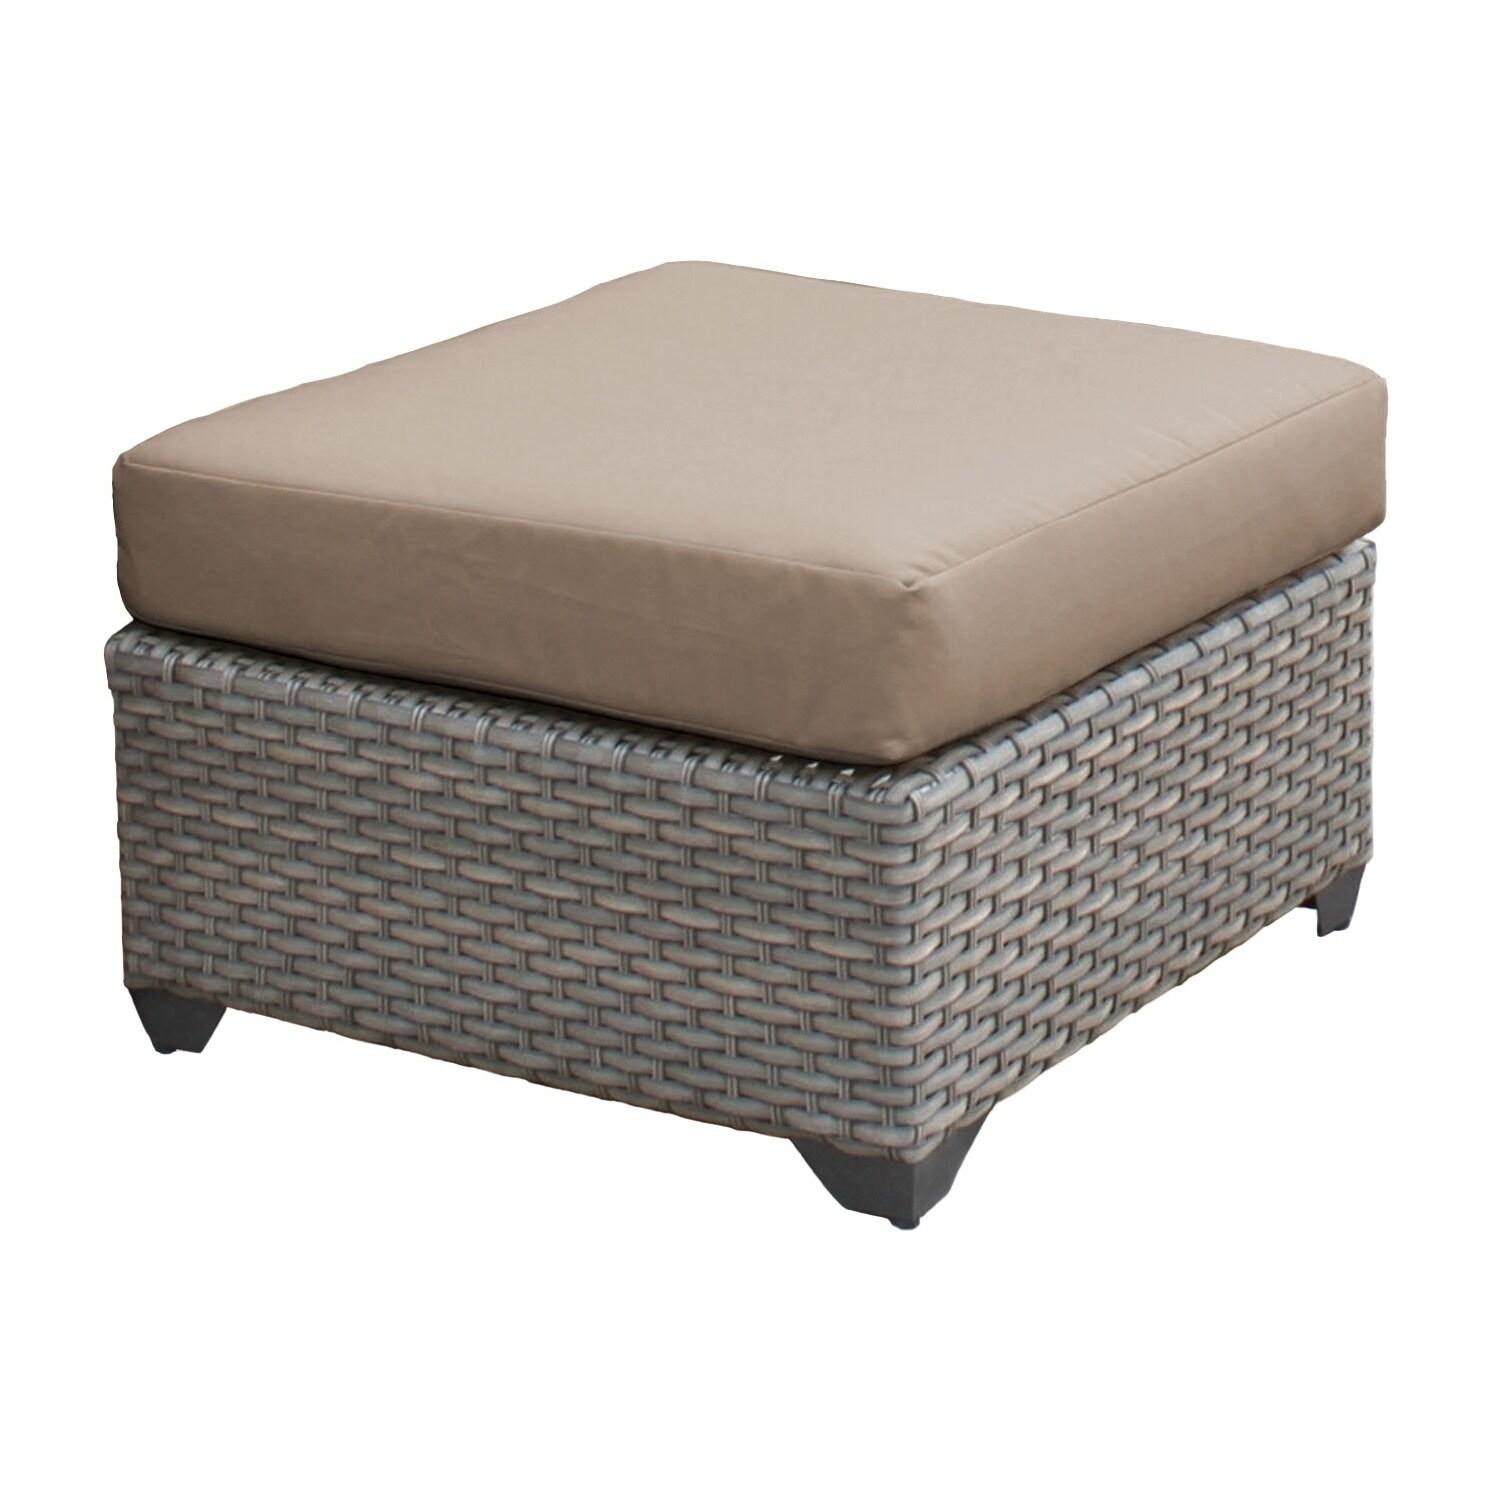 Kinbor Wicker Ottoman Seat 2 Piece Outdoor Footrest Ottoman With Dark Grey Cushions Ottomans